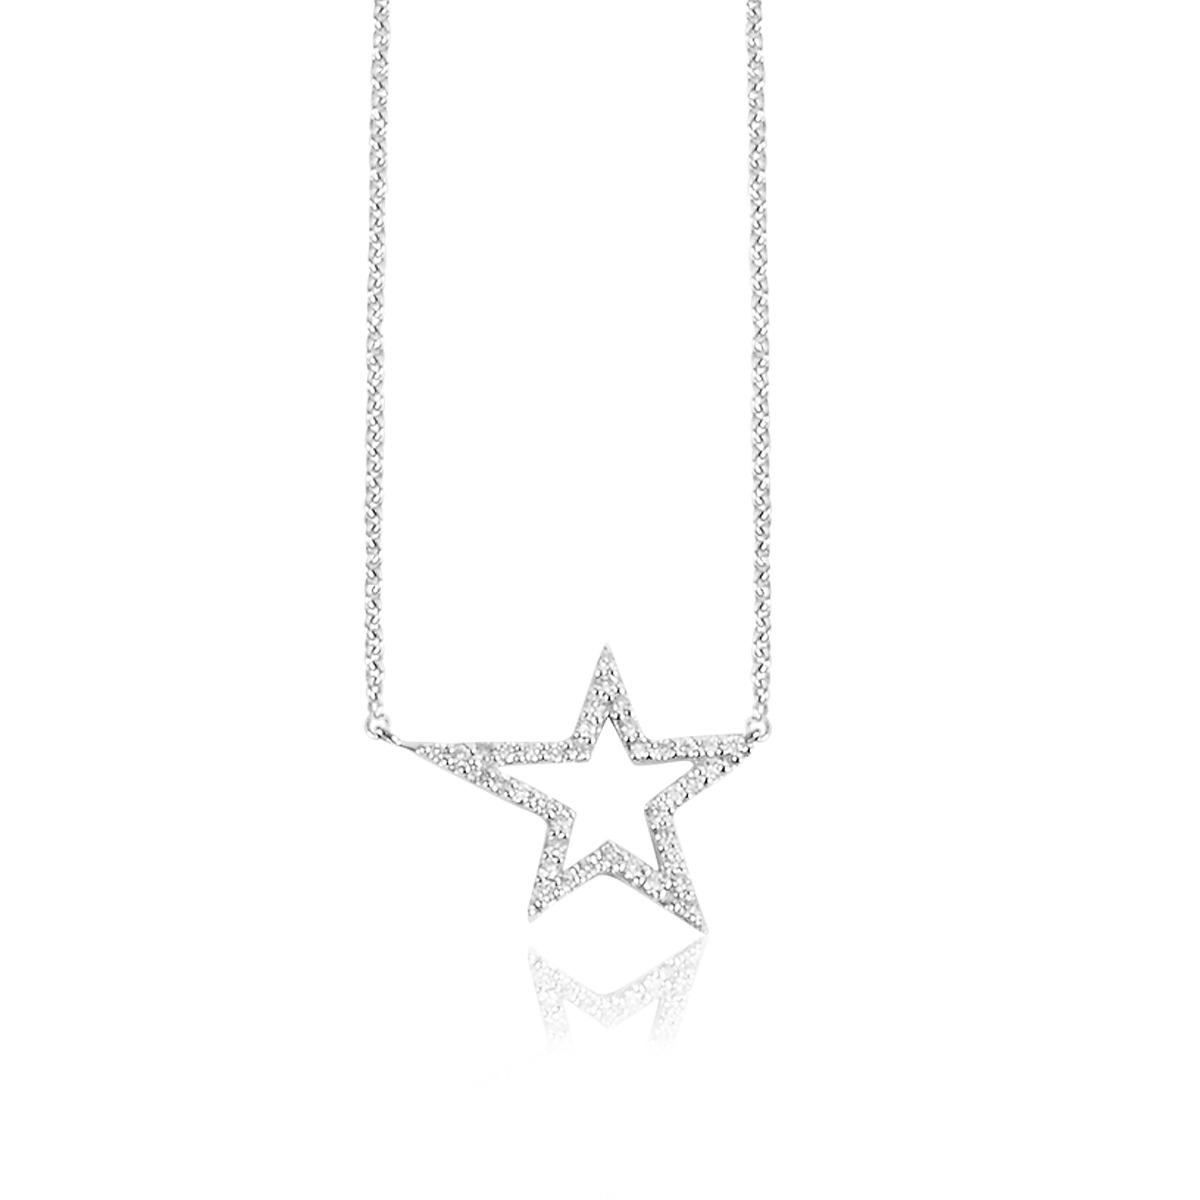 18ct White Gold Diamond Pavé Set Star Pendant with Chain